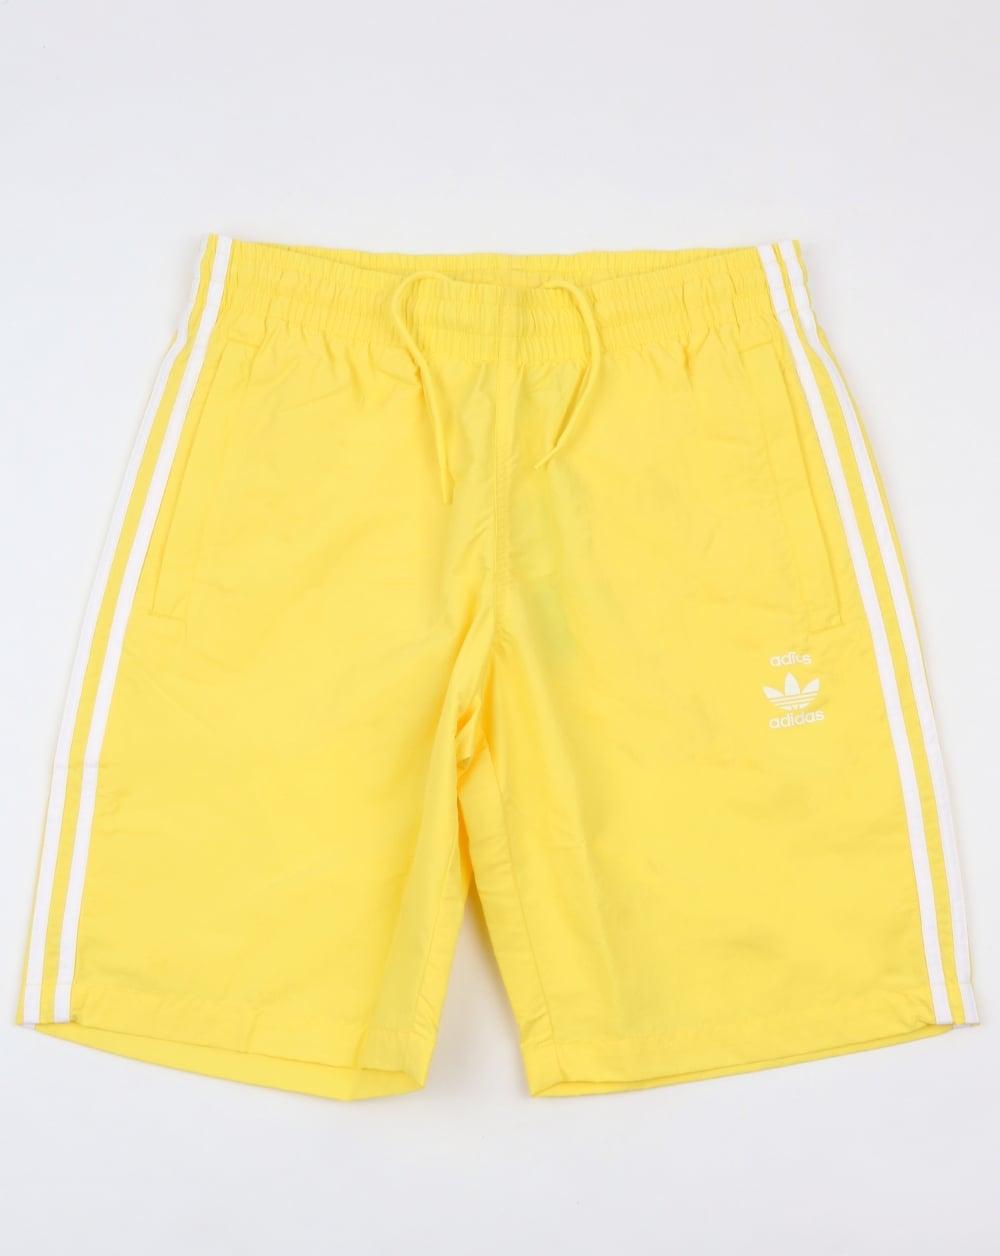 d7bc6c06d0971 adidas Originals Adidas Originals 3 Stripes Swim Shorts Intense Lemon